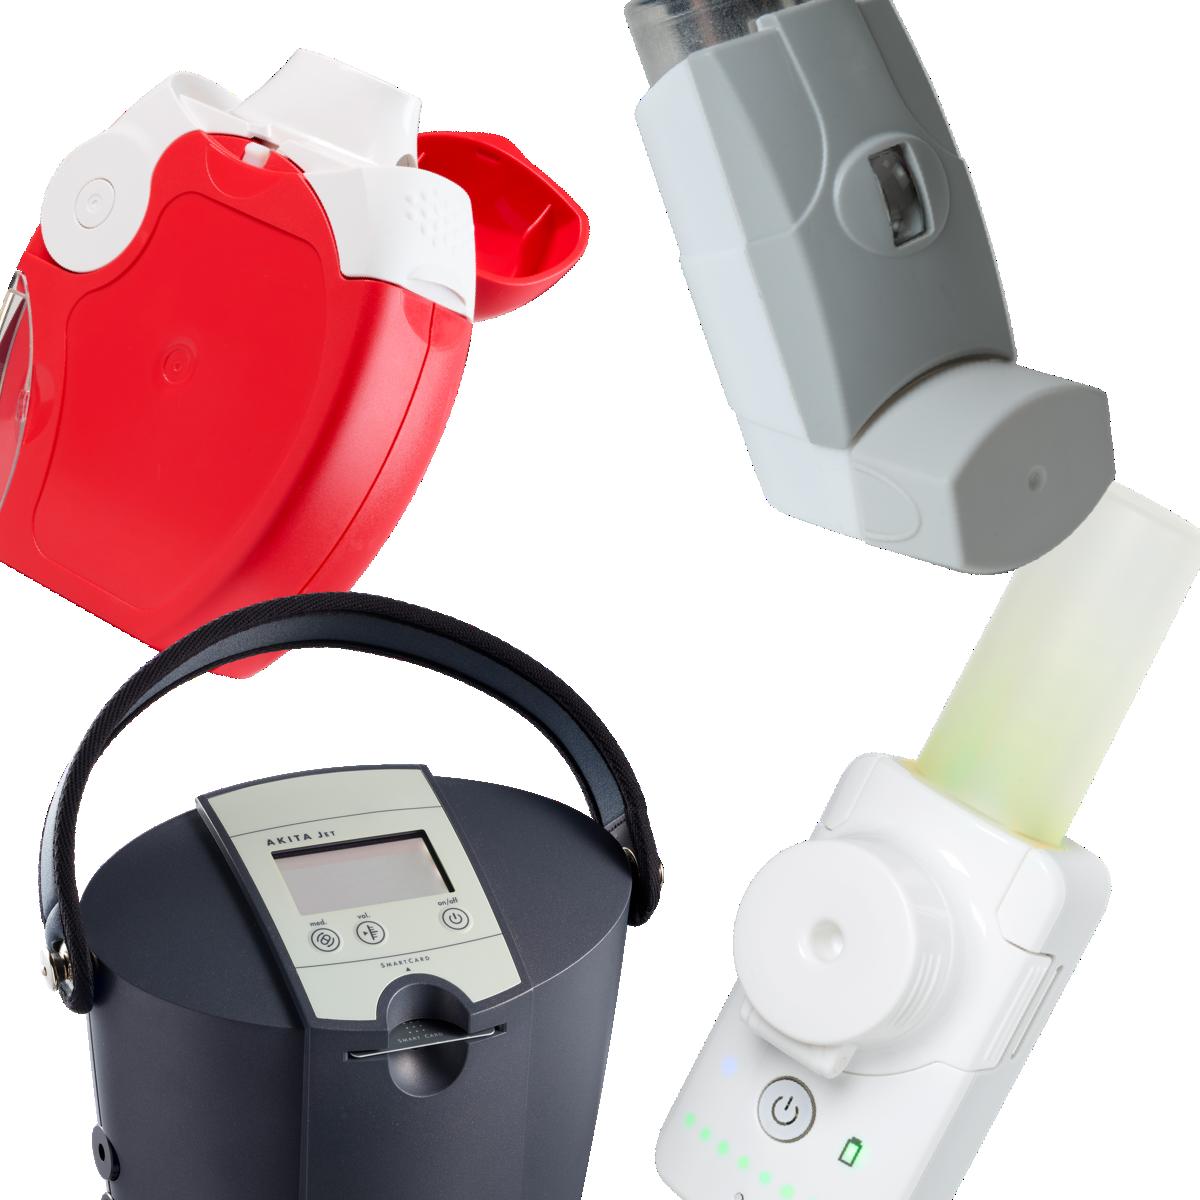 Inhalation Device Platforms